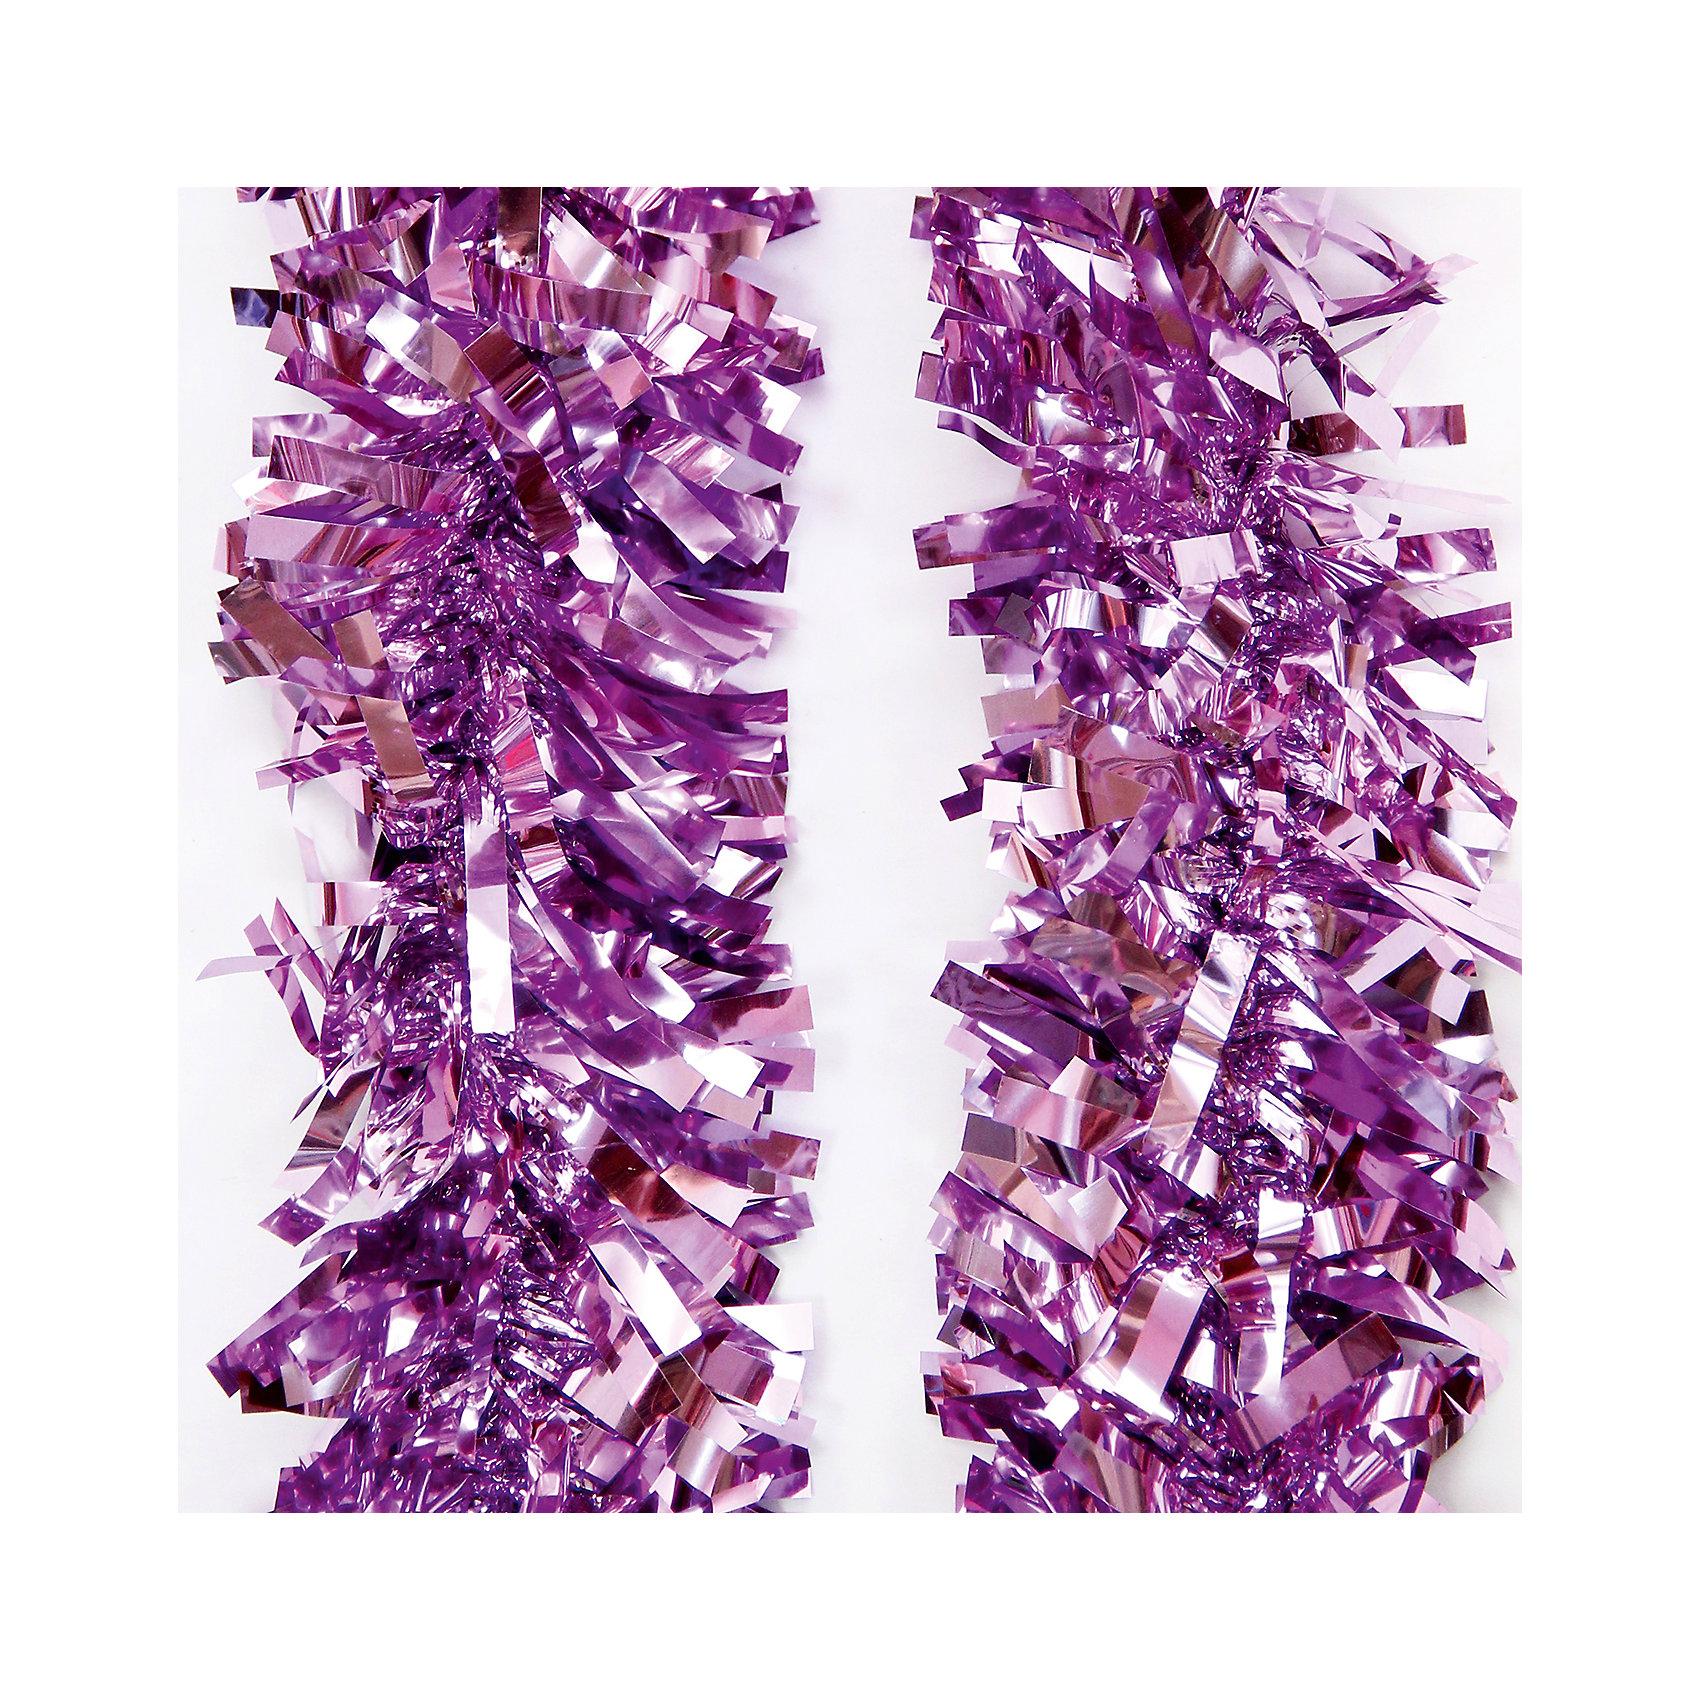 Magic Time Мишура 9*200 см мишура новогодняя magic time цвет золотистый диаметр 6 см длина 200 см 75763